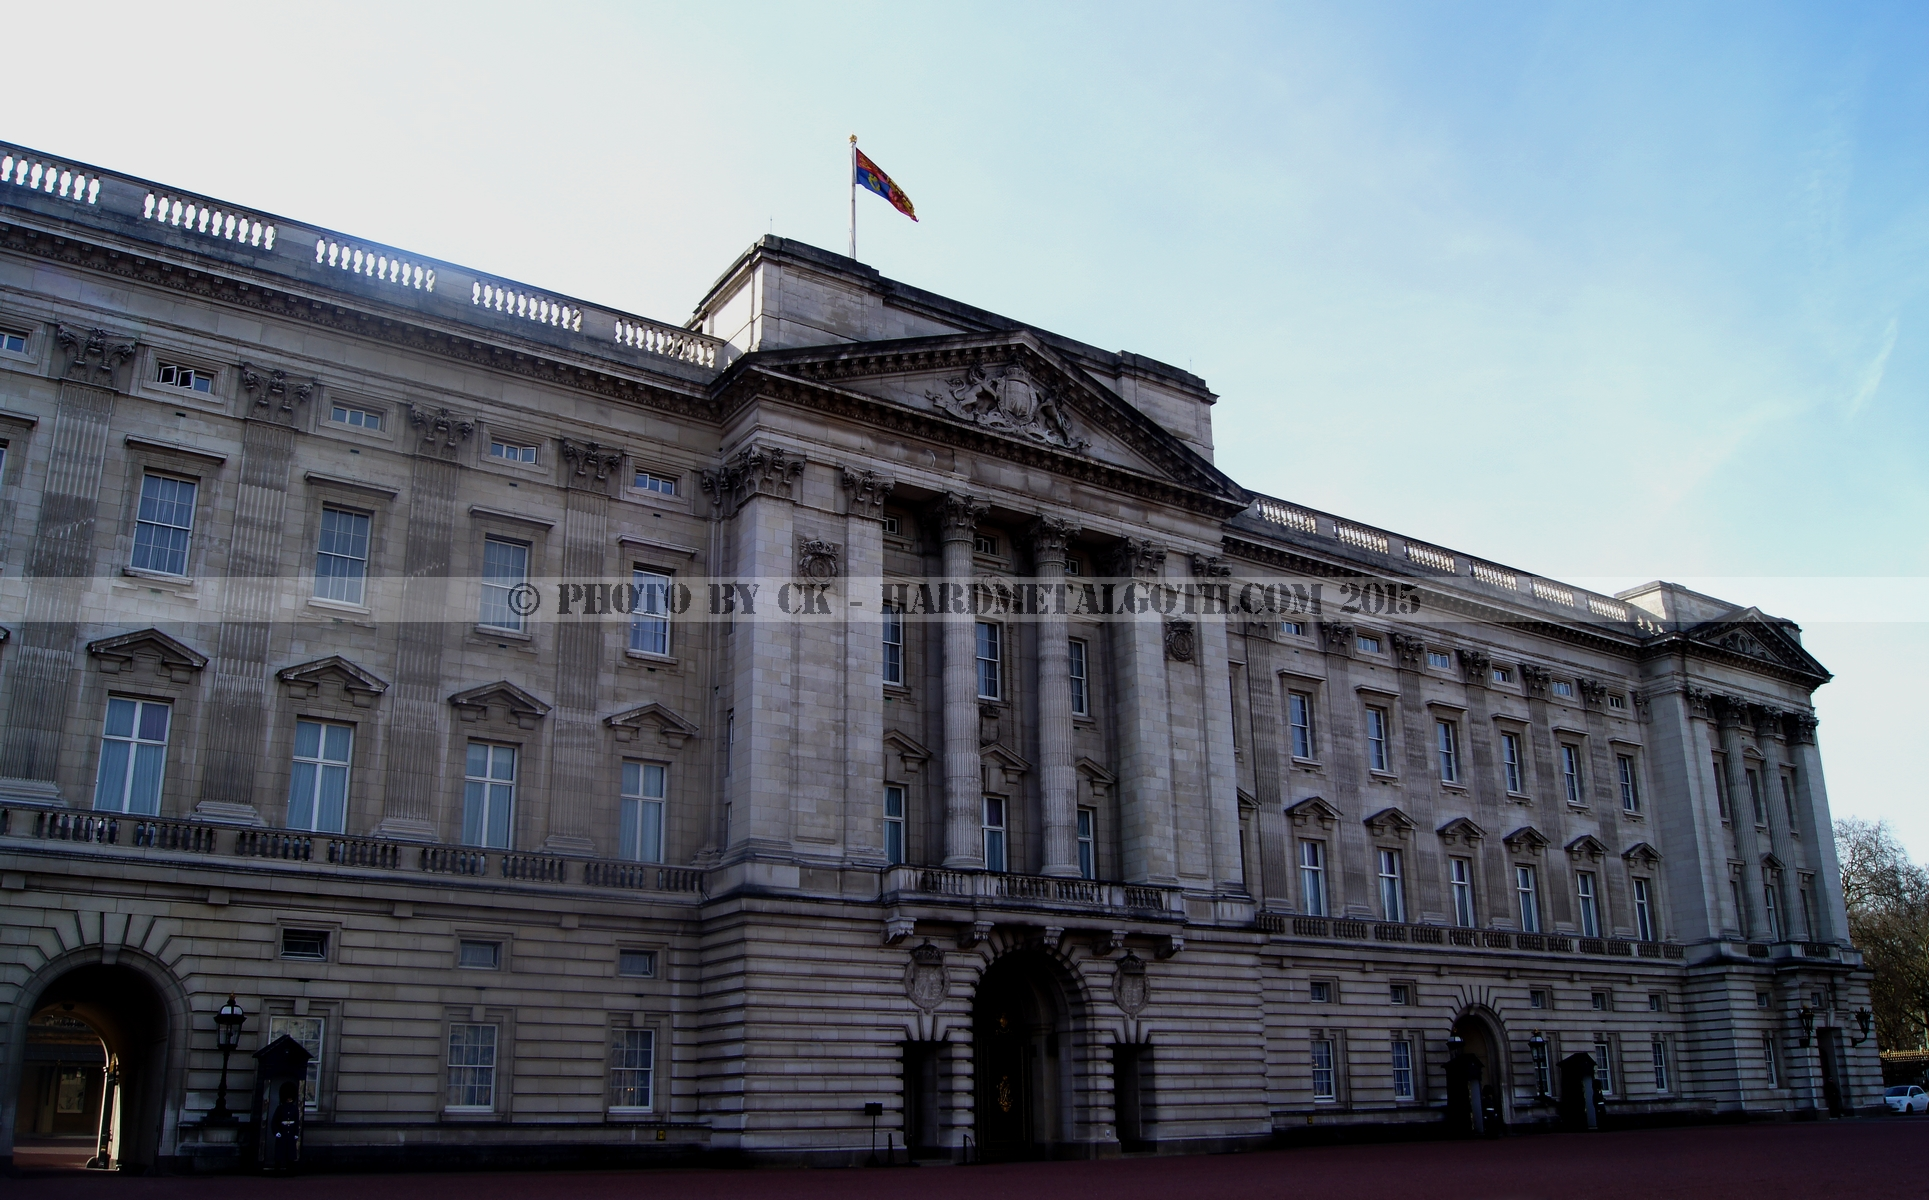 Buckingham Palace 03.jpg